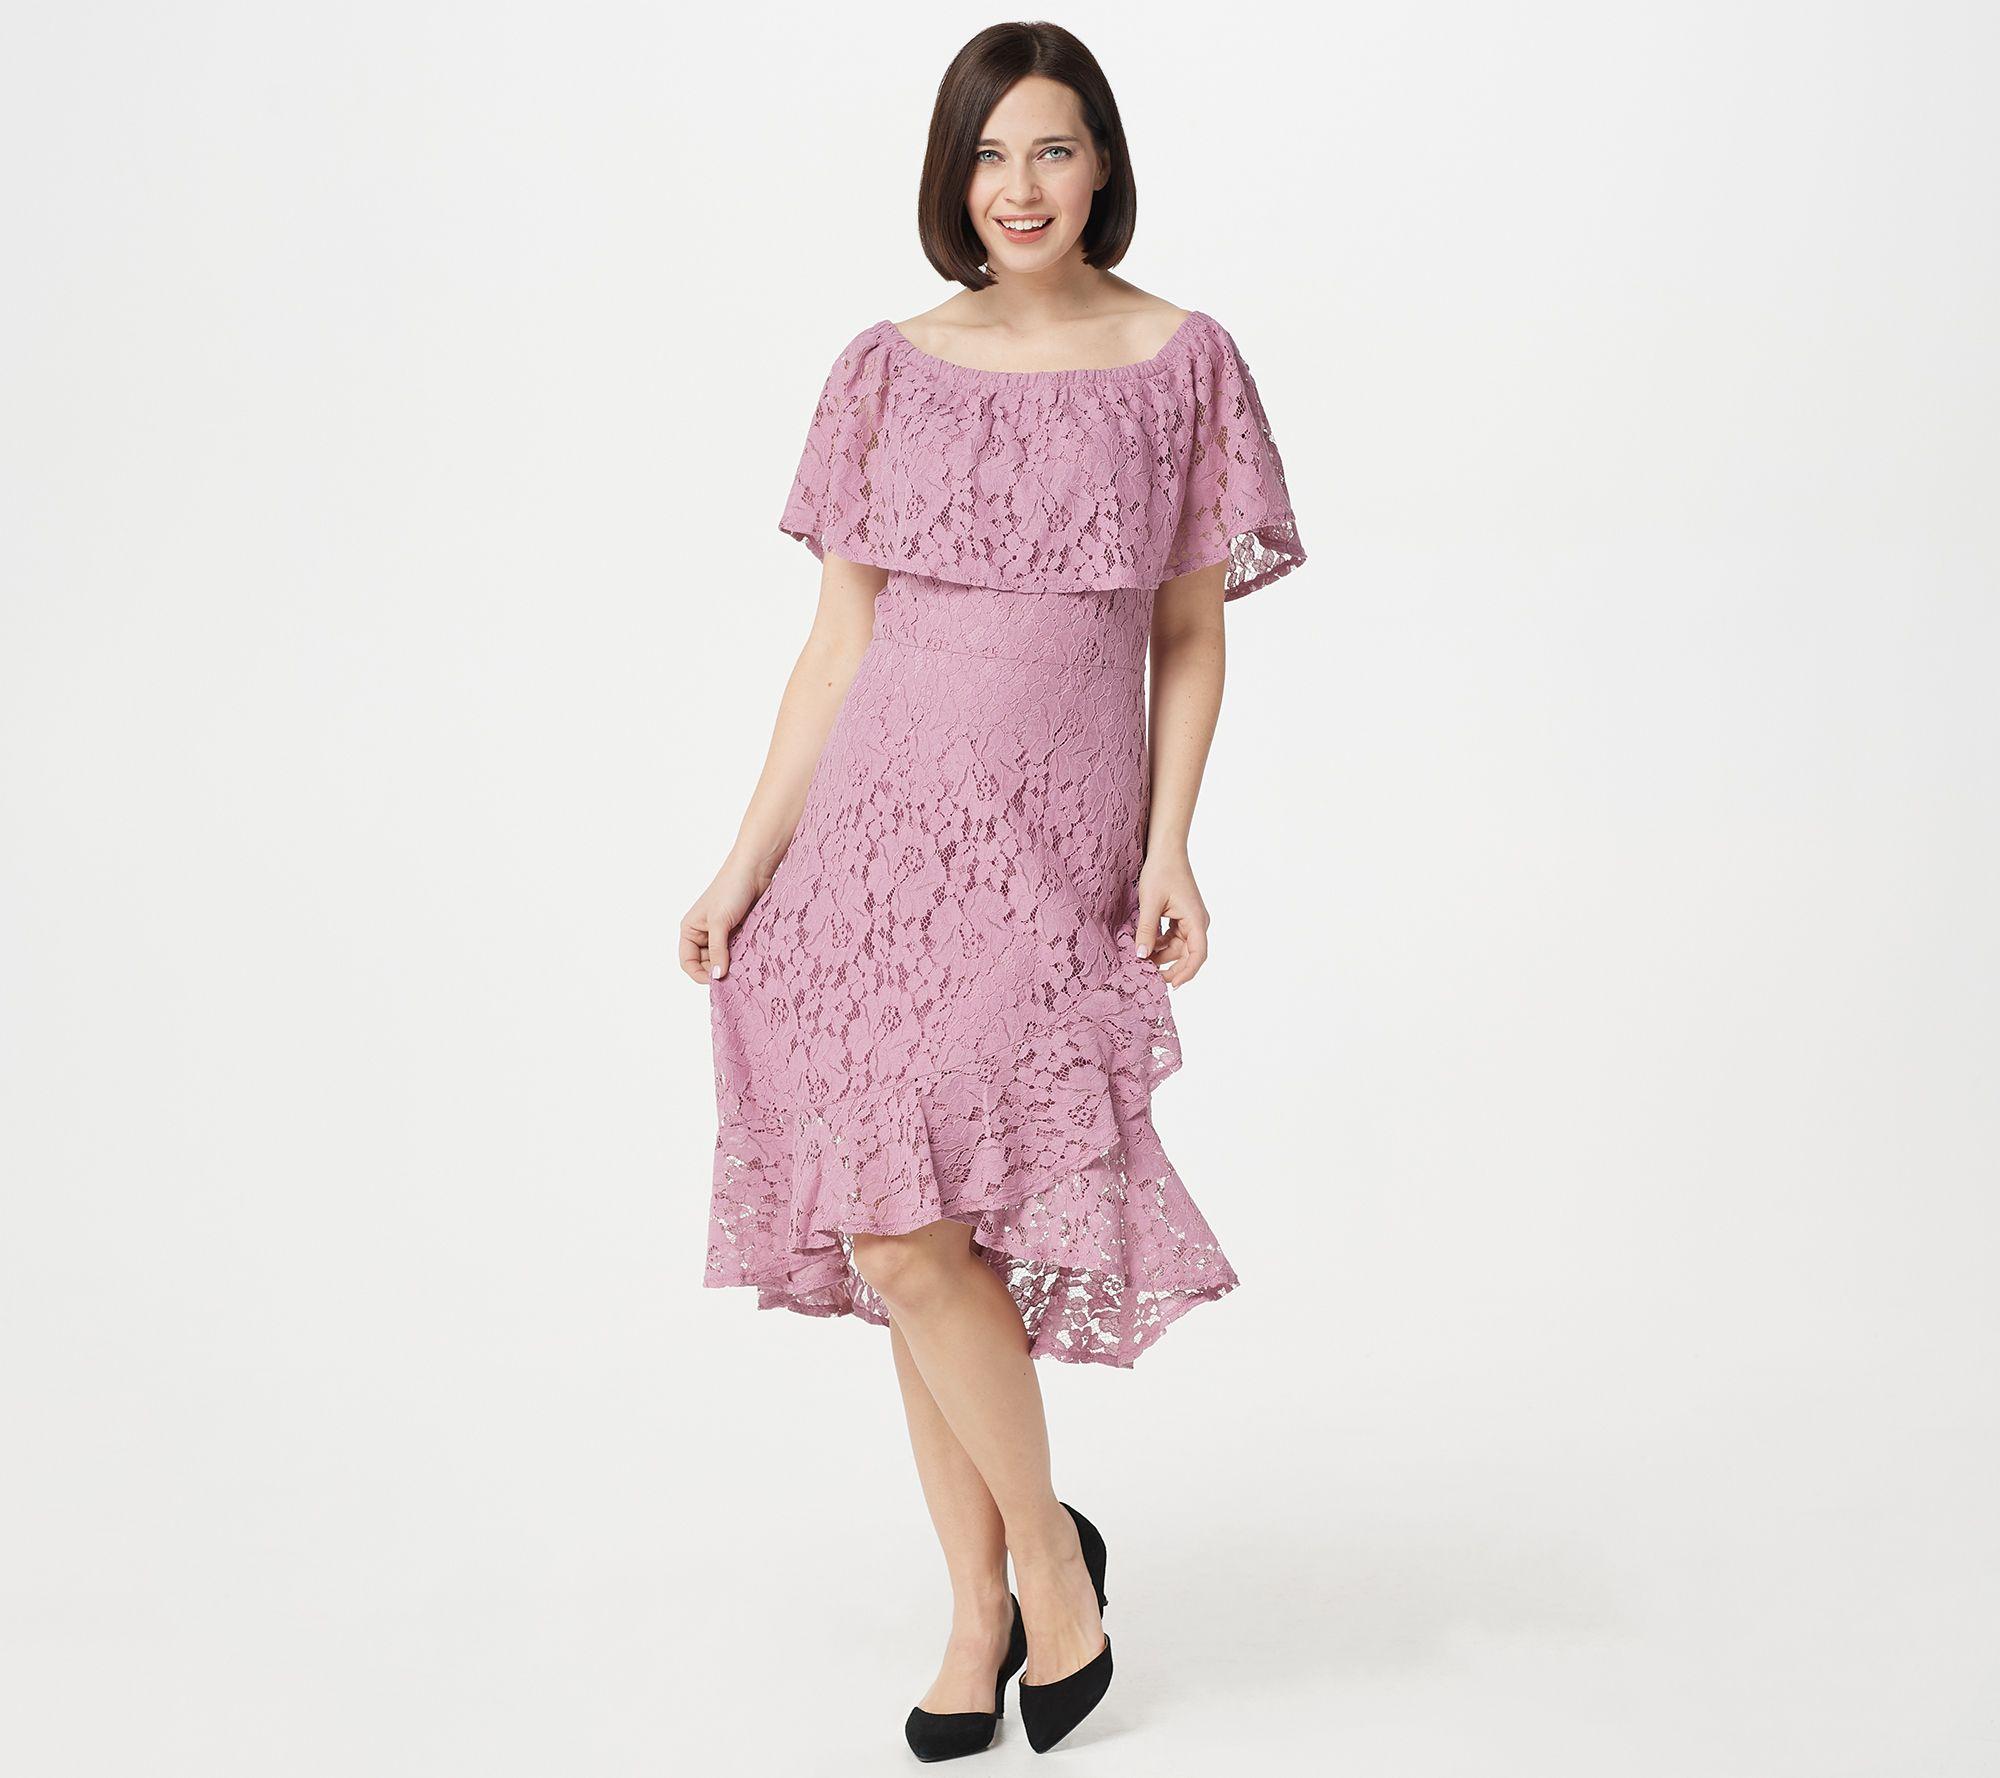 f1cc5549e9990e Isaac Mizrahi Live! Convertible Lace Dress with Tulip Hem - Page 1 — QVC.com